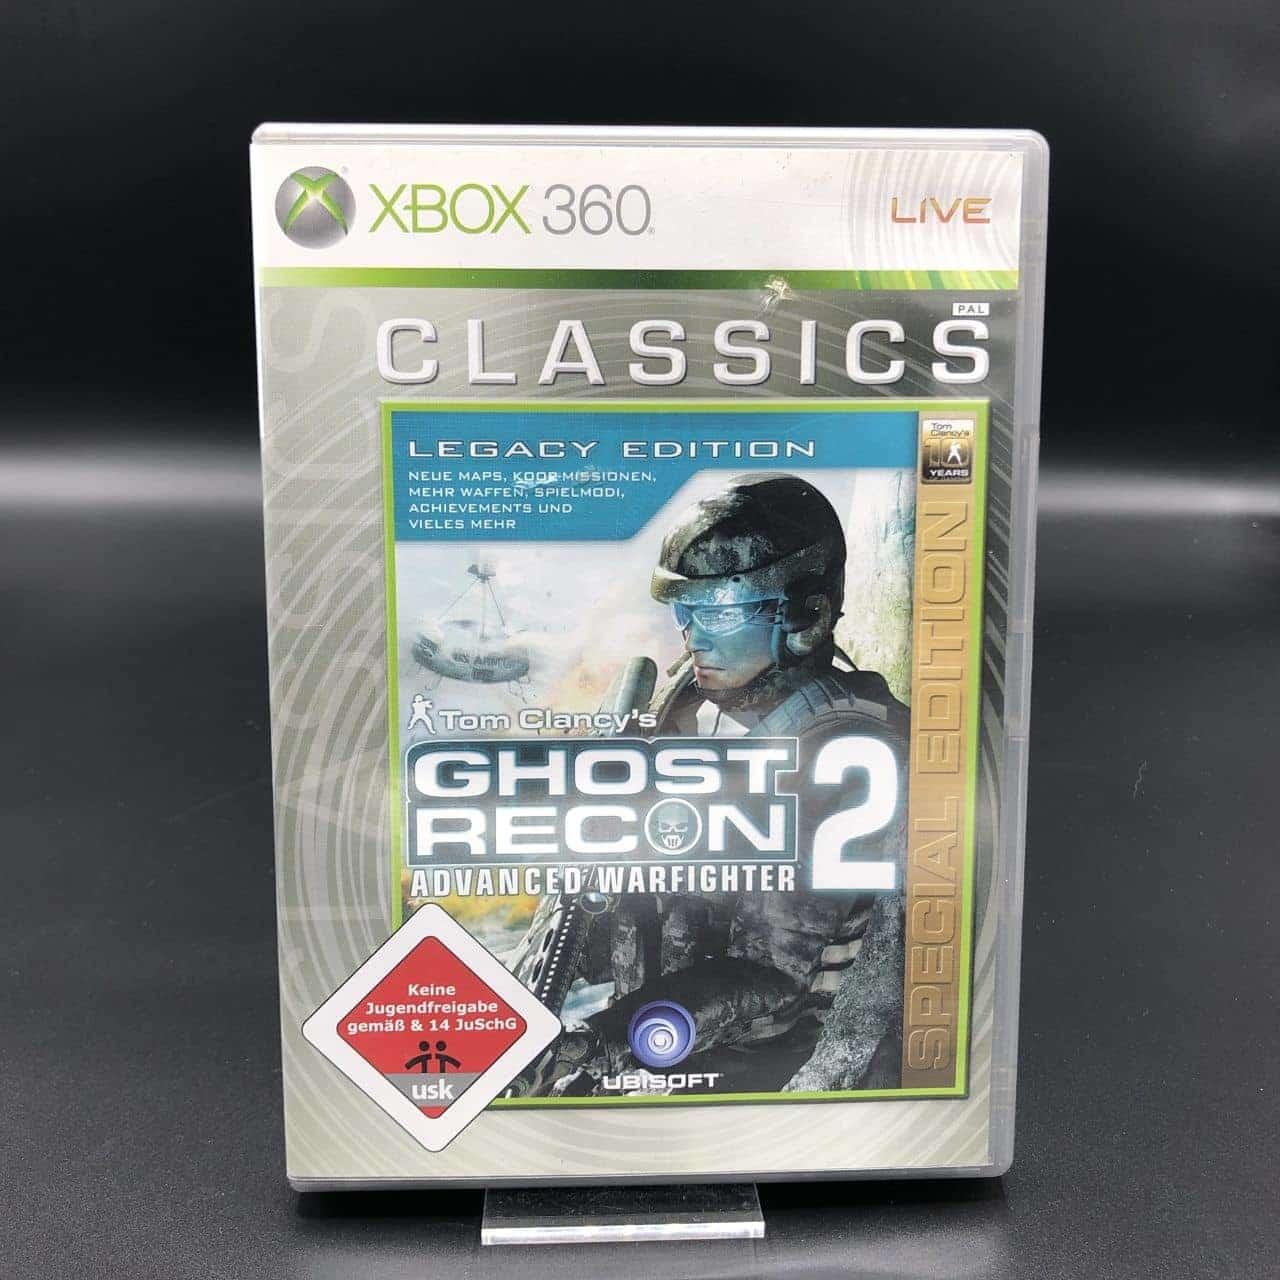 Tom Clancy's Ghost Recon Advanced Warfighter 2 (Legacy Edition) (Classics) (Komplett) (Sehr gut) Xbox 360 (FSK18)